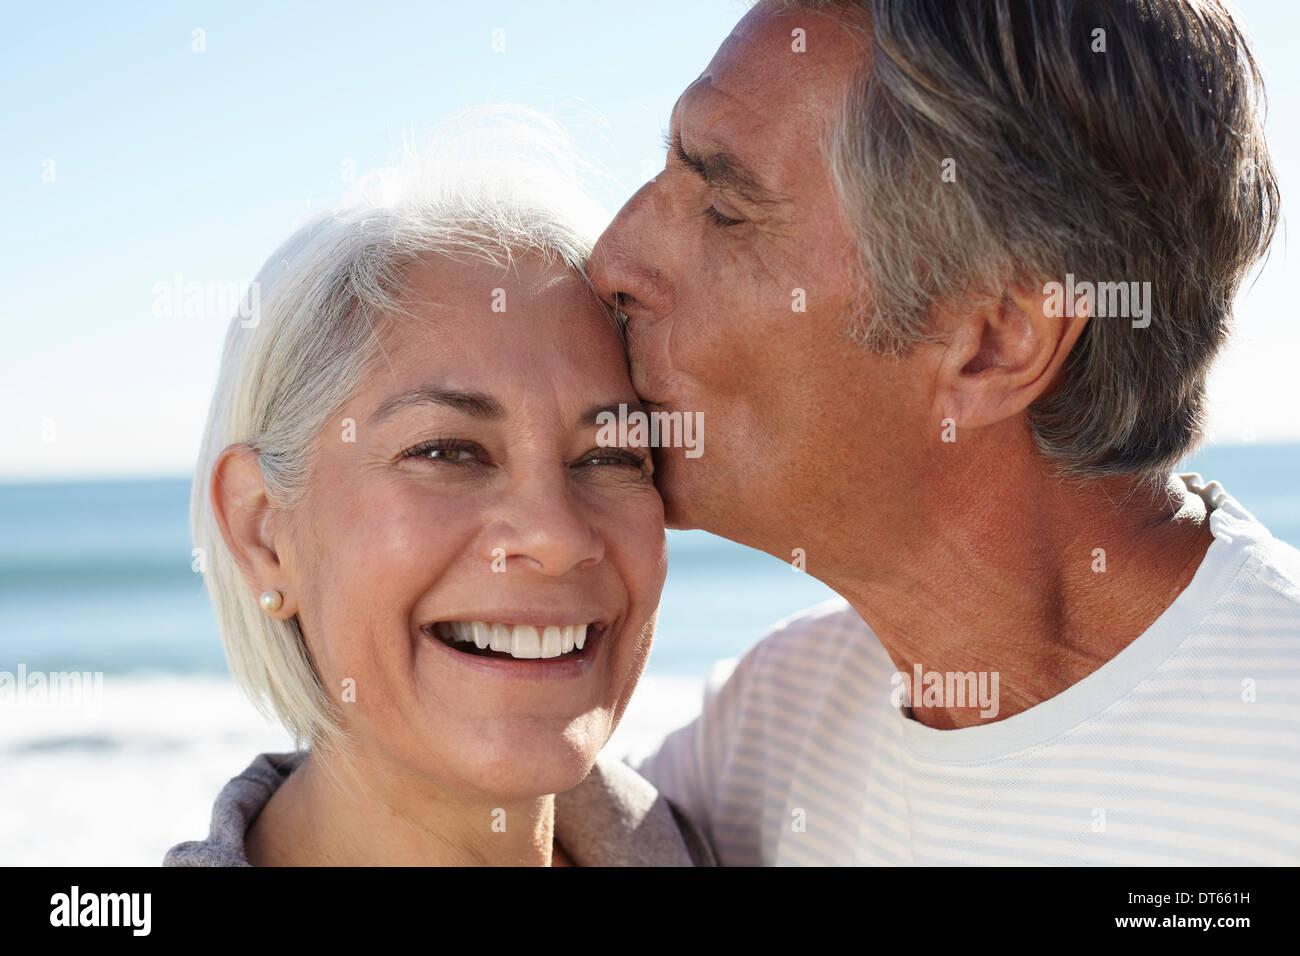 Man kissing woman on forehead Photo Stock